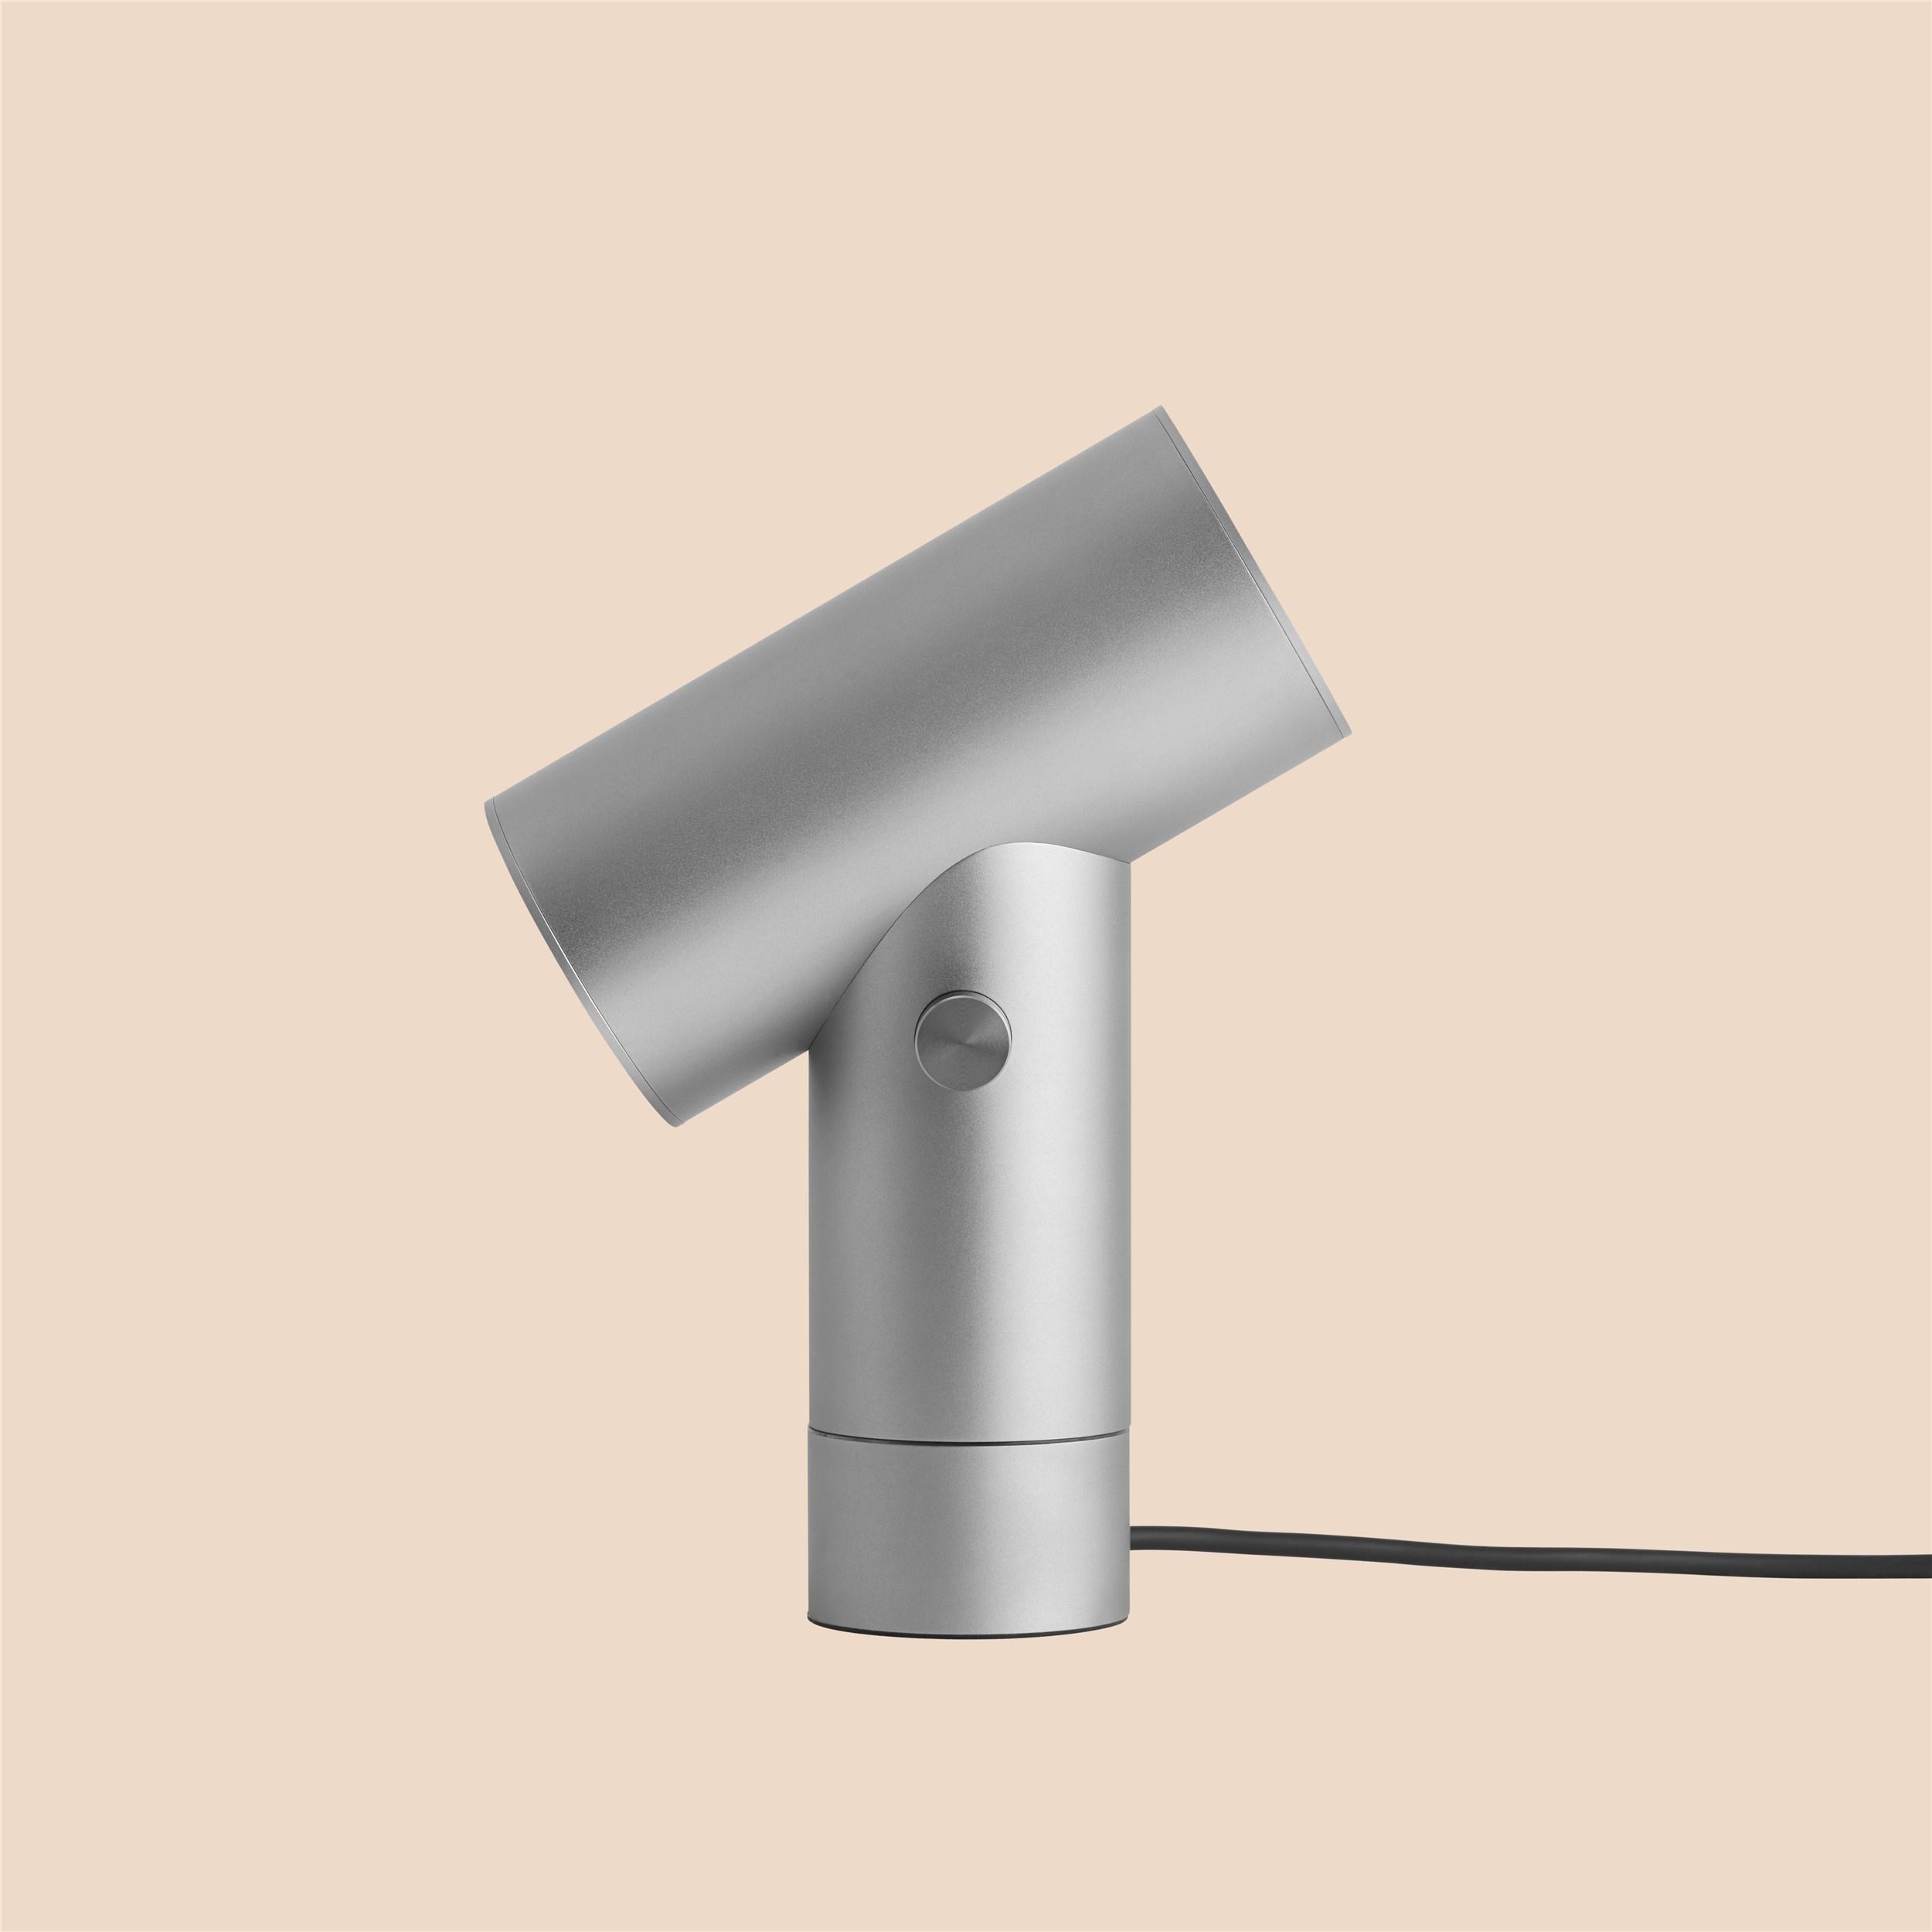 skandinavisches design lampe beam von muuto. Black Bedroom Furniture Sets. Home Design Ideas